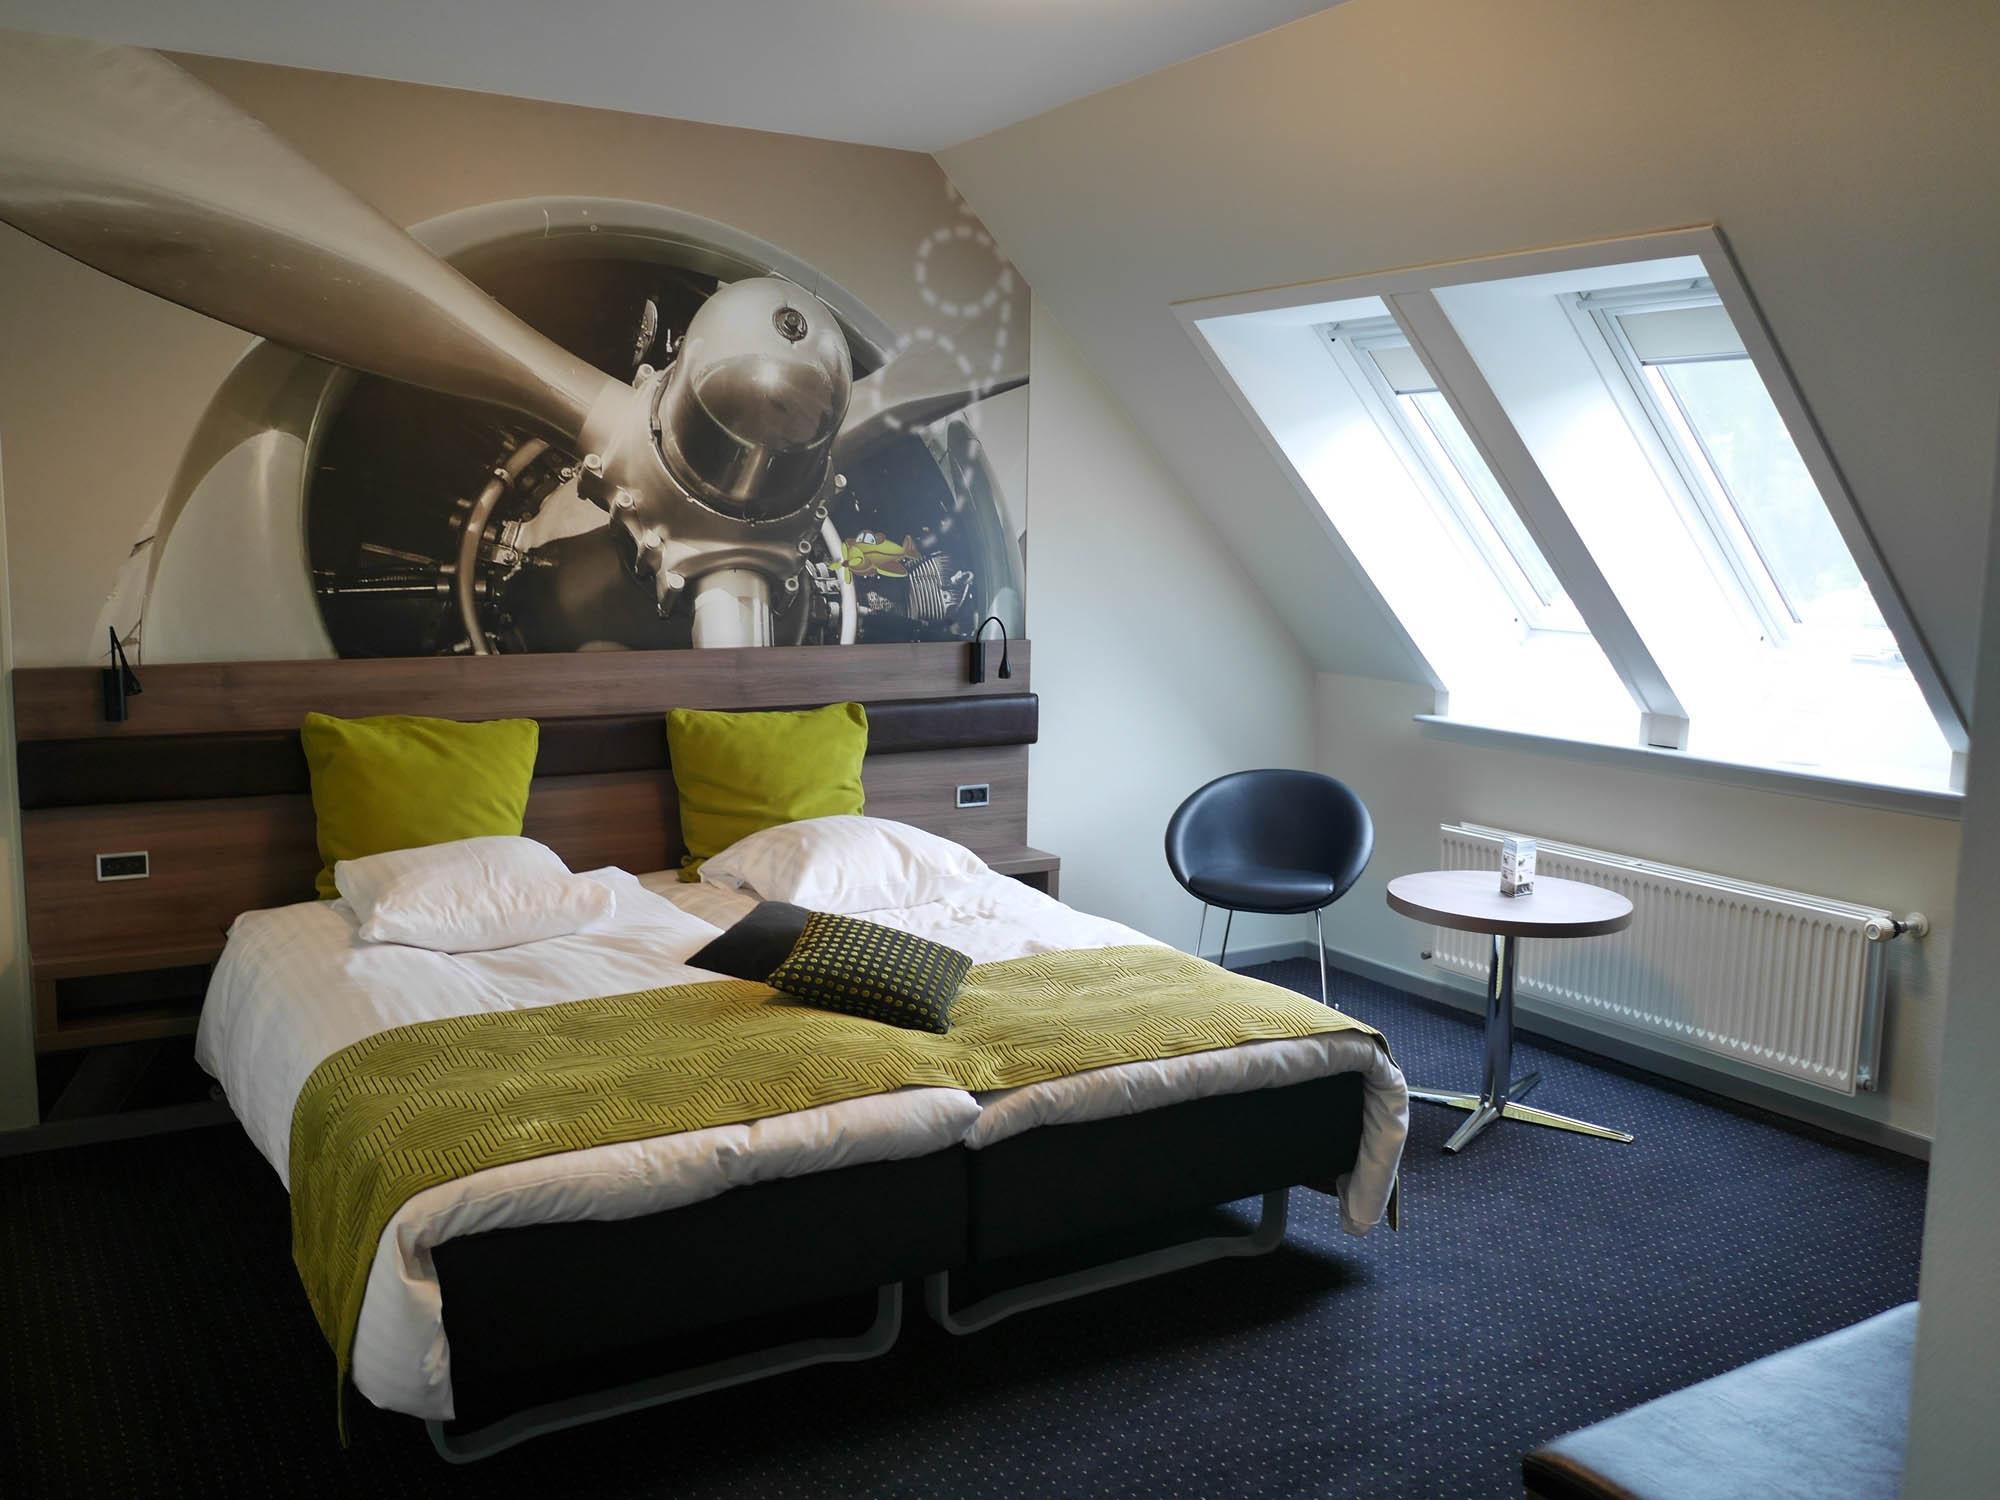 Fasjonable Hotell nära Legoland Billund - Hotel Propellen - Matochresebloggen IS-13